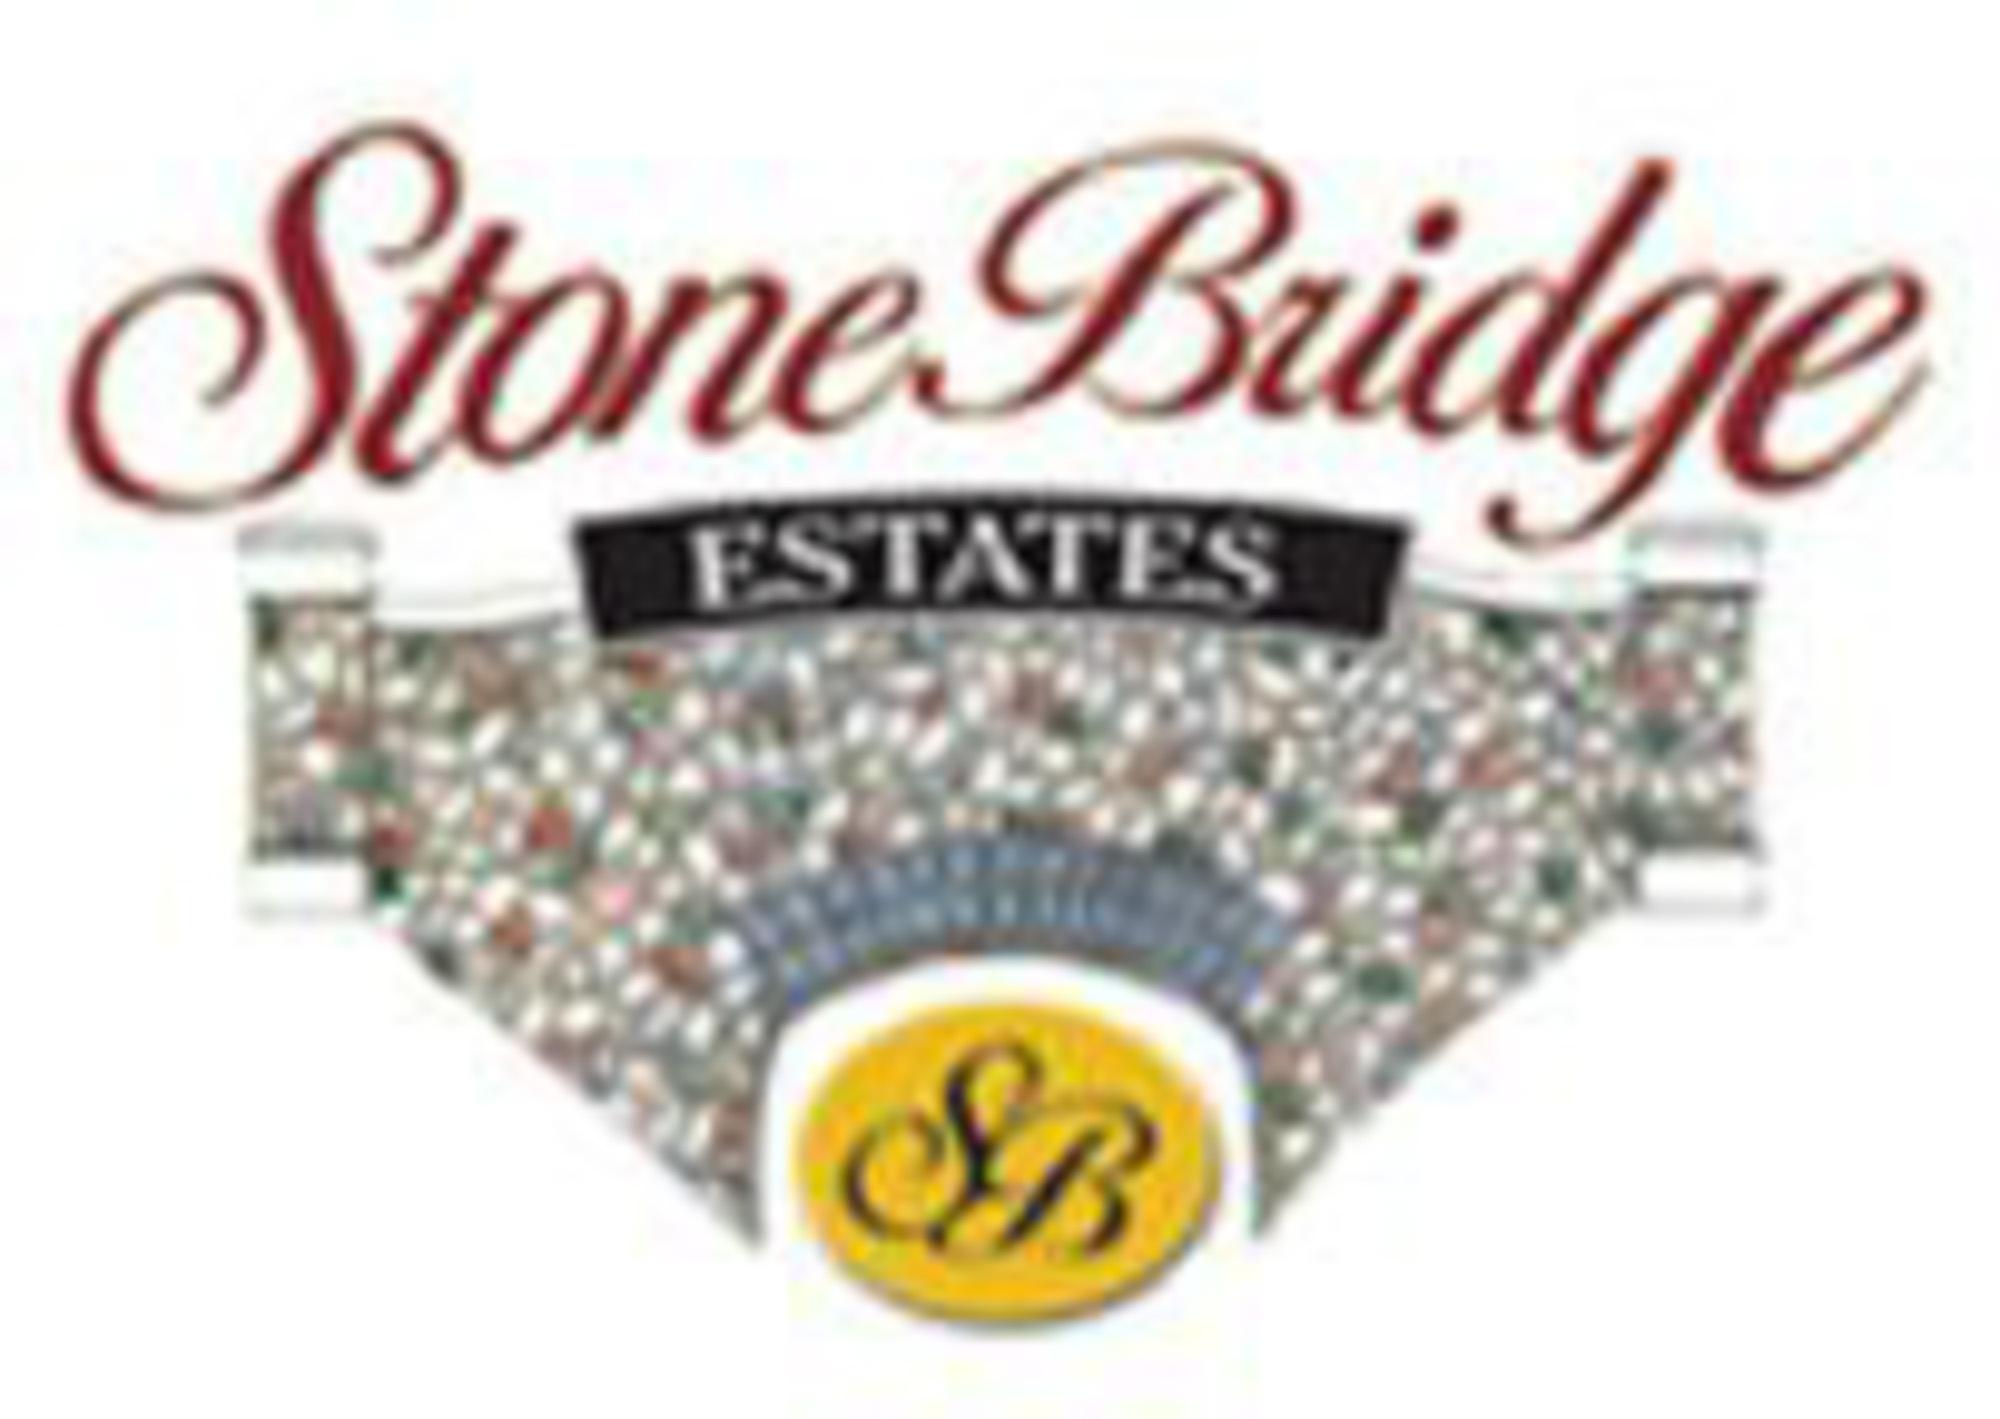 StoneBridge Estates LOGO